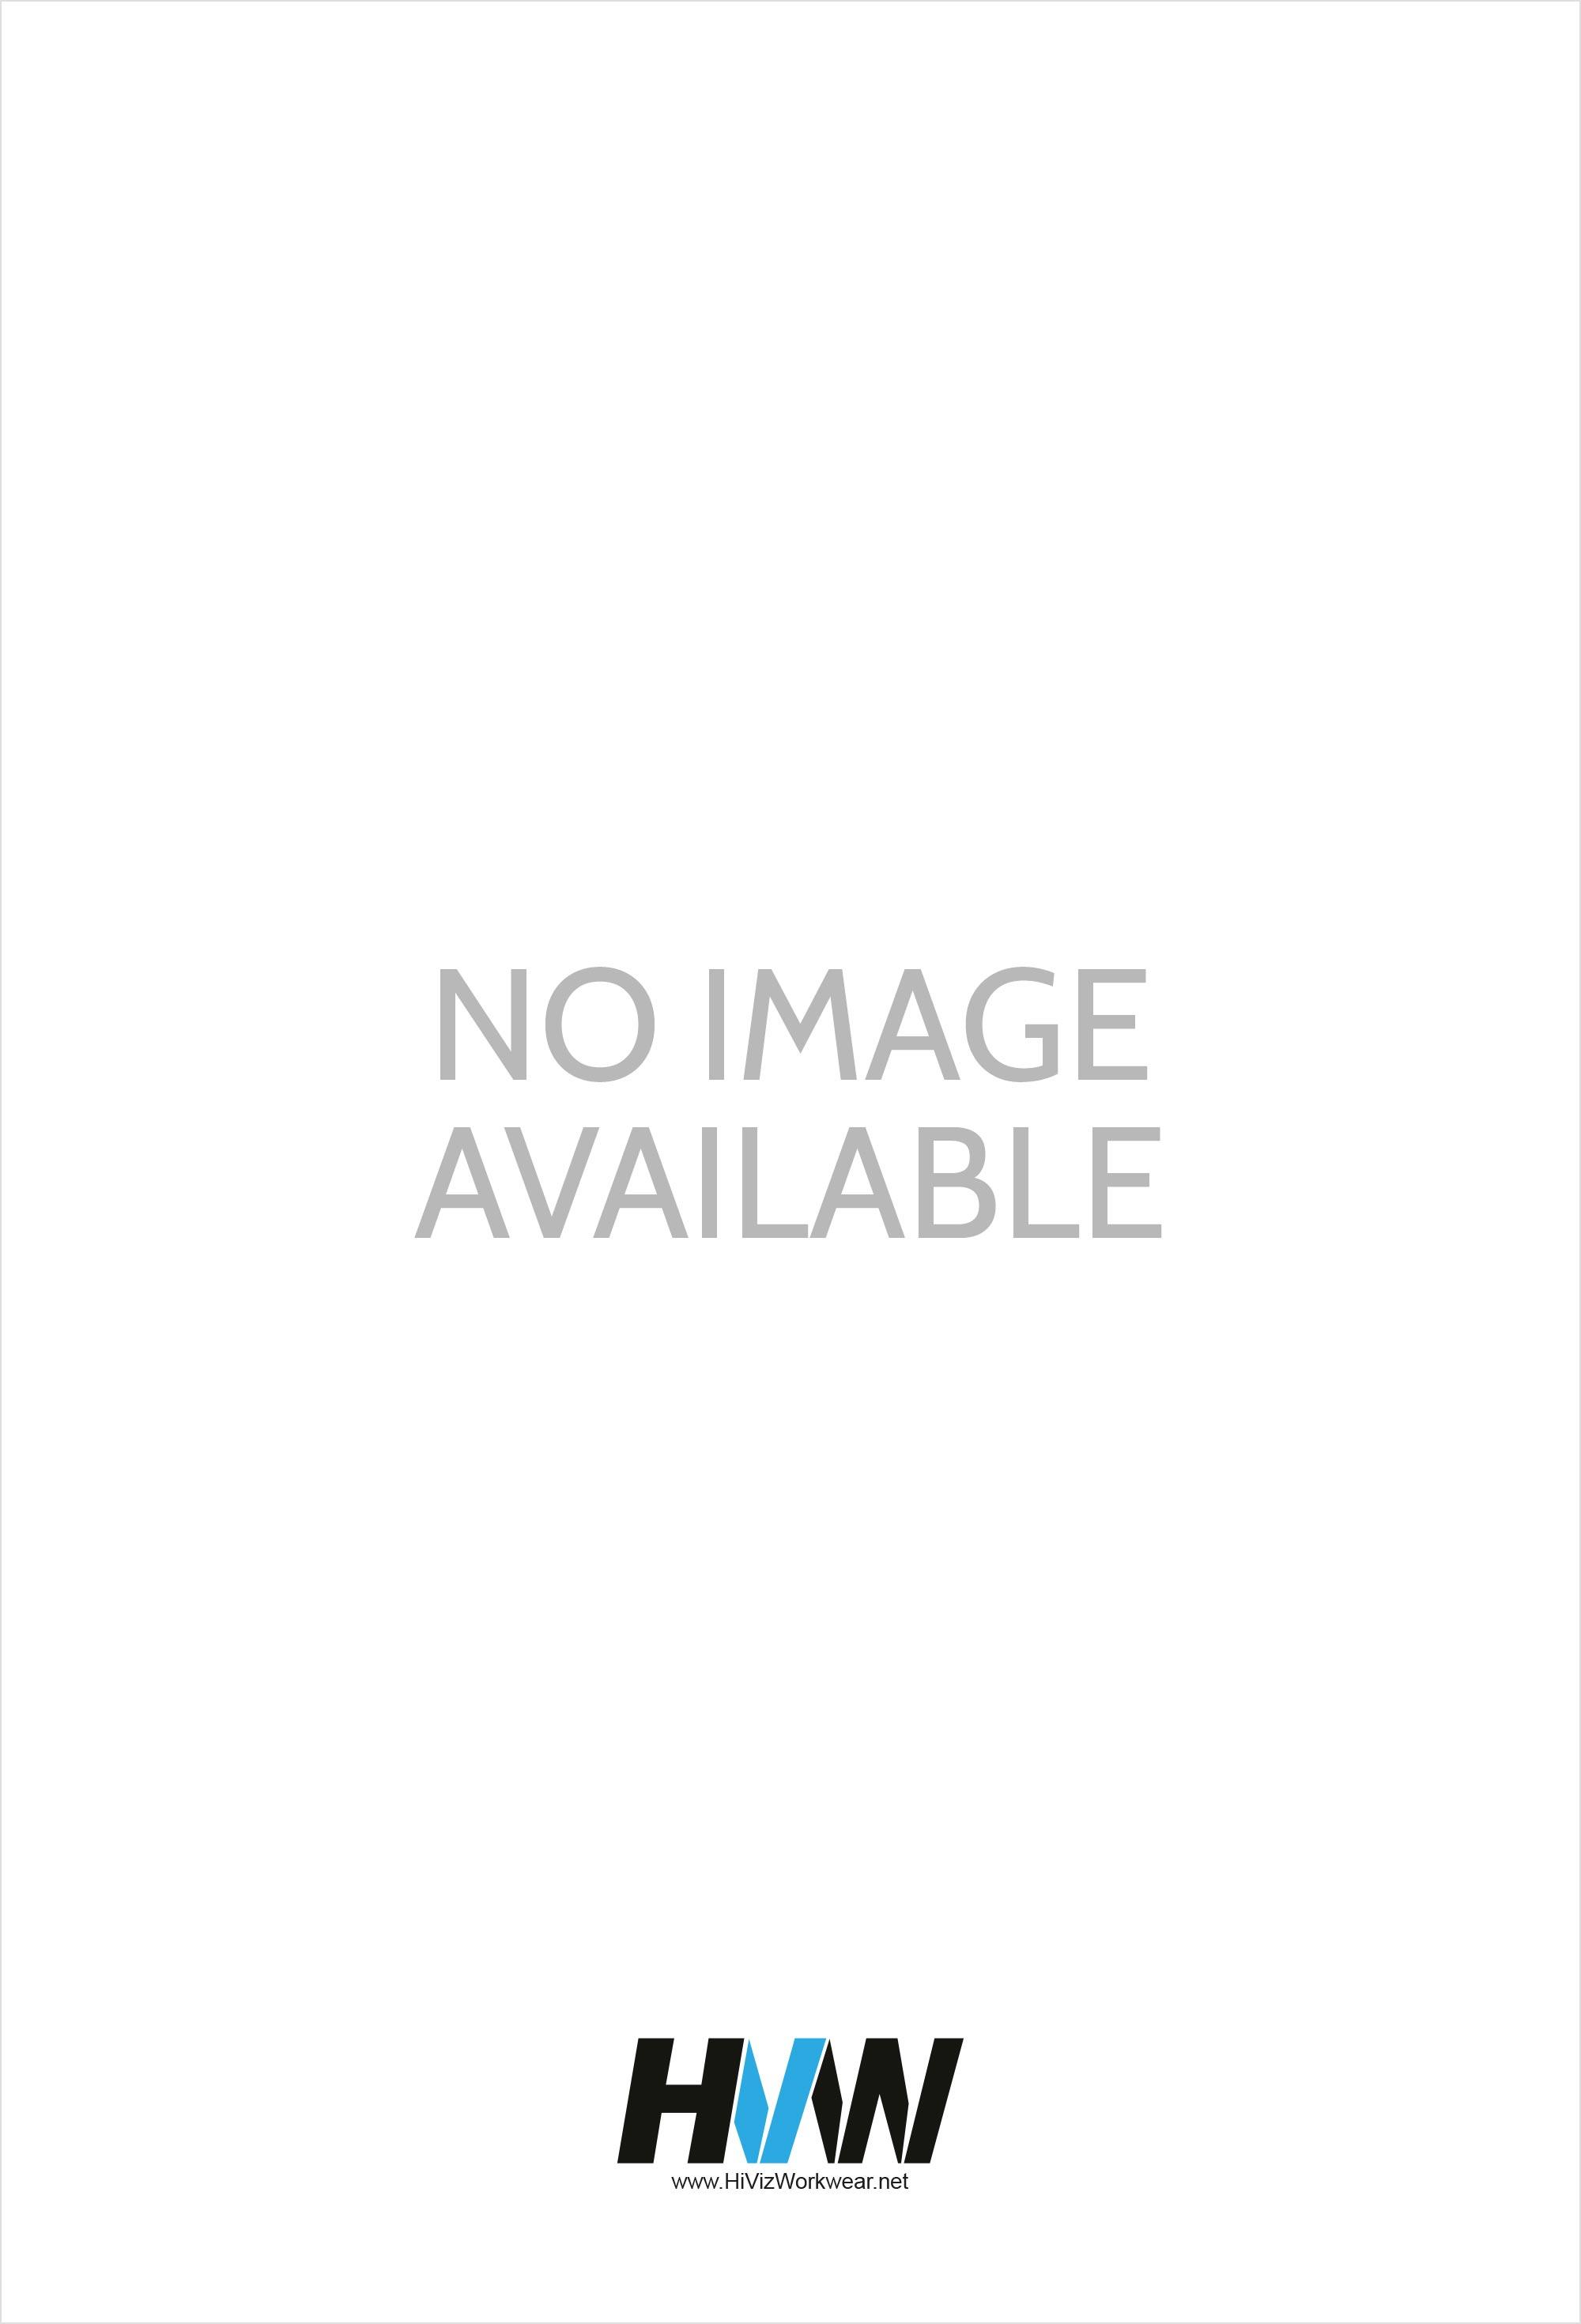 WCENG Standard Hi Vis Vest (Small to 6XL)